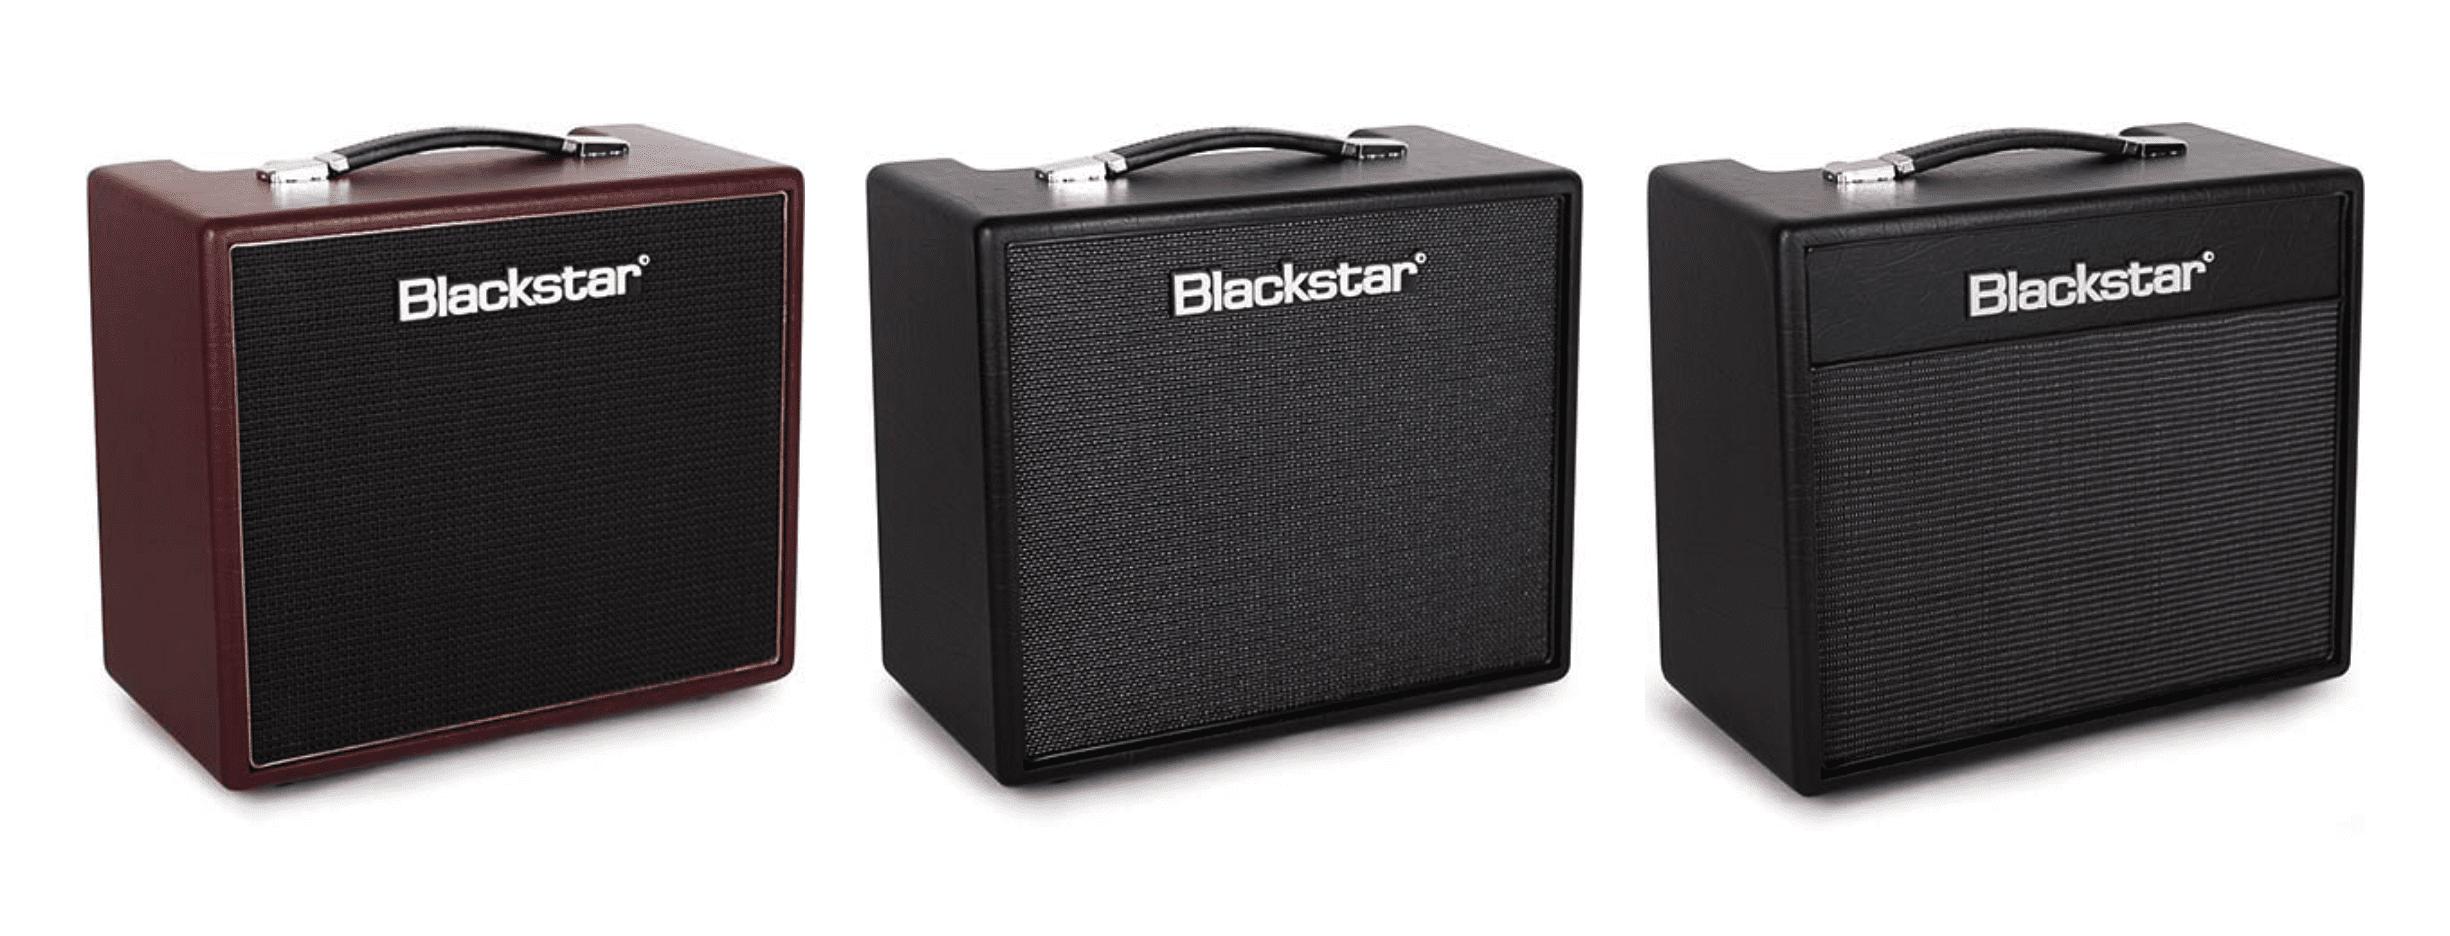 Blackstar 10th Anniversary